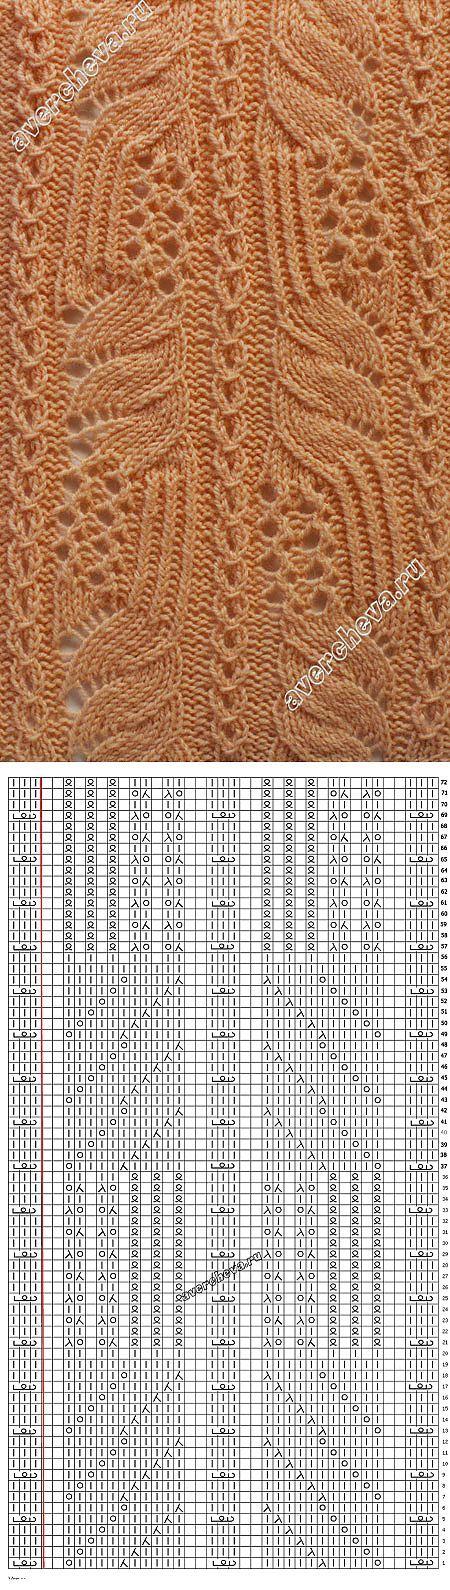 knitting pattern with needles ... ♥ Deniz ♥